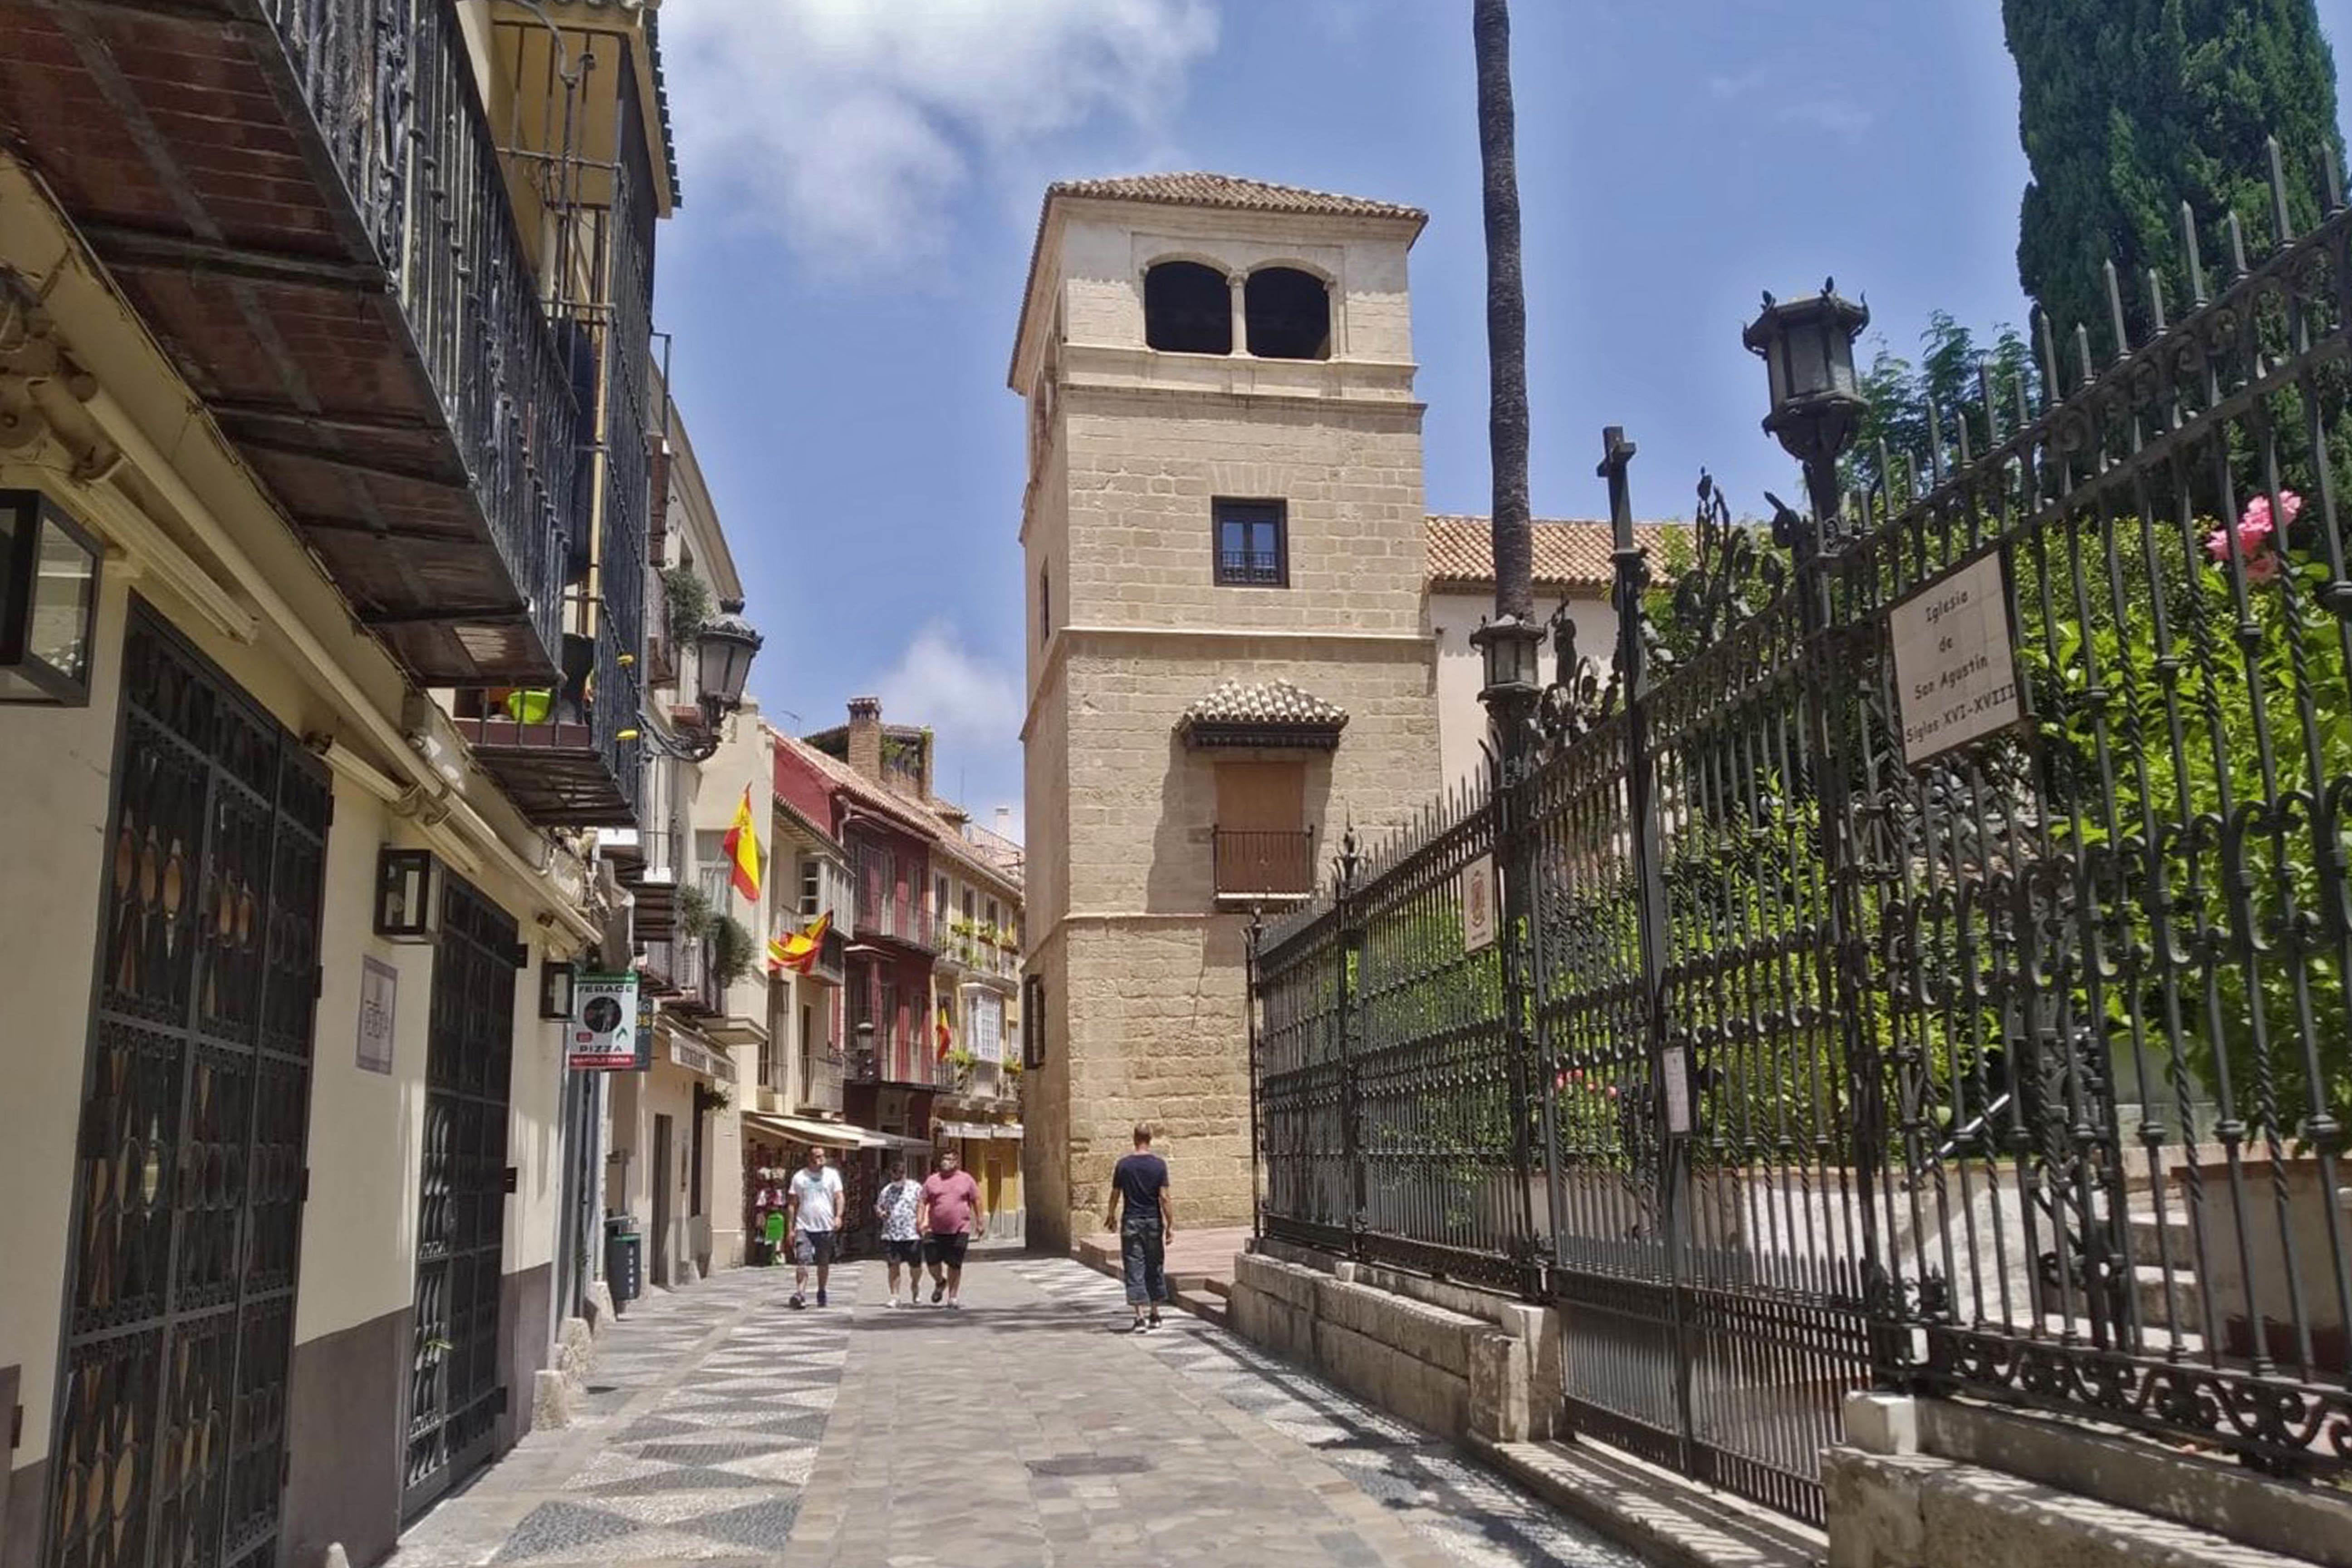 Free-Tour-historic-centre-of-Malaga-at-sunset-3